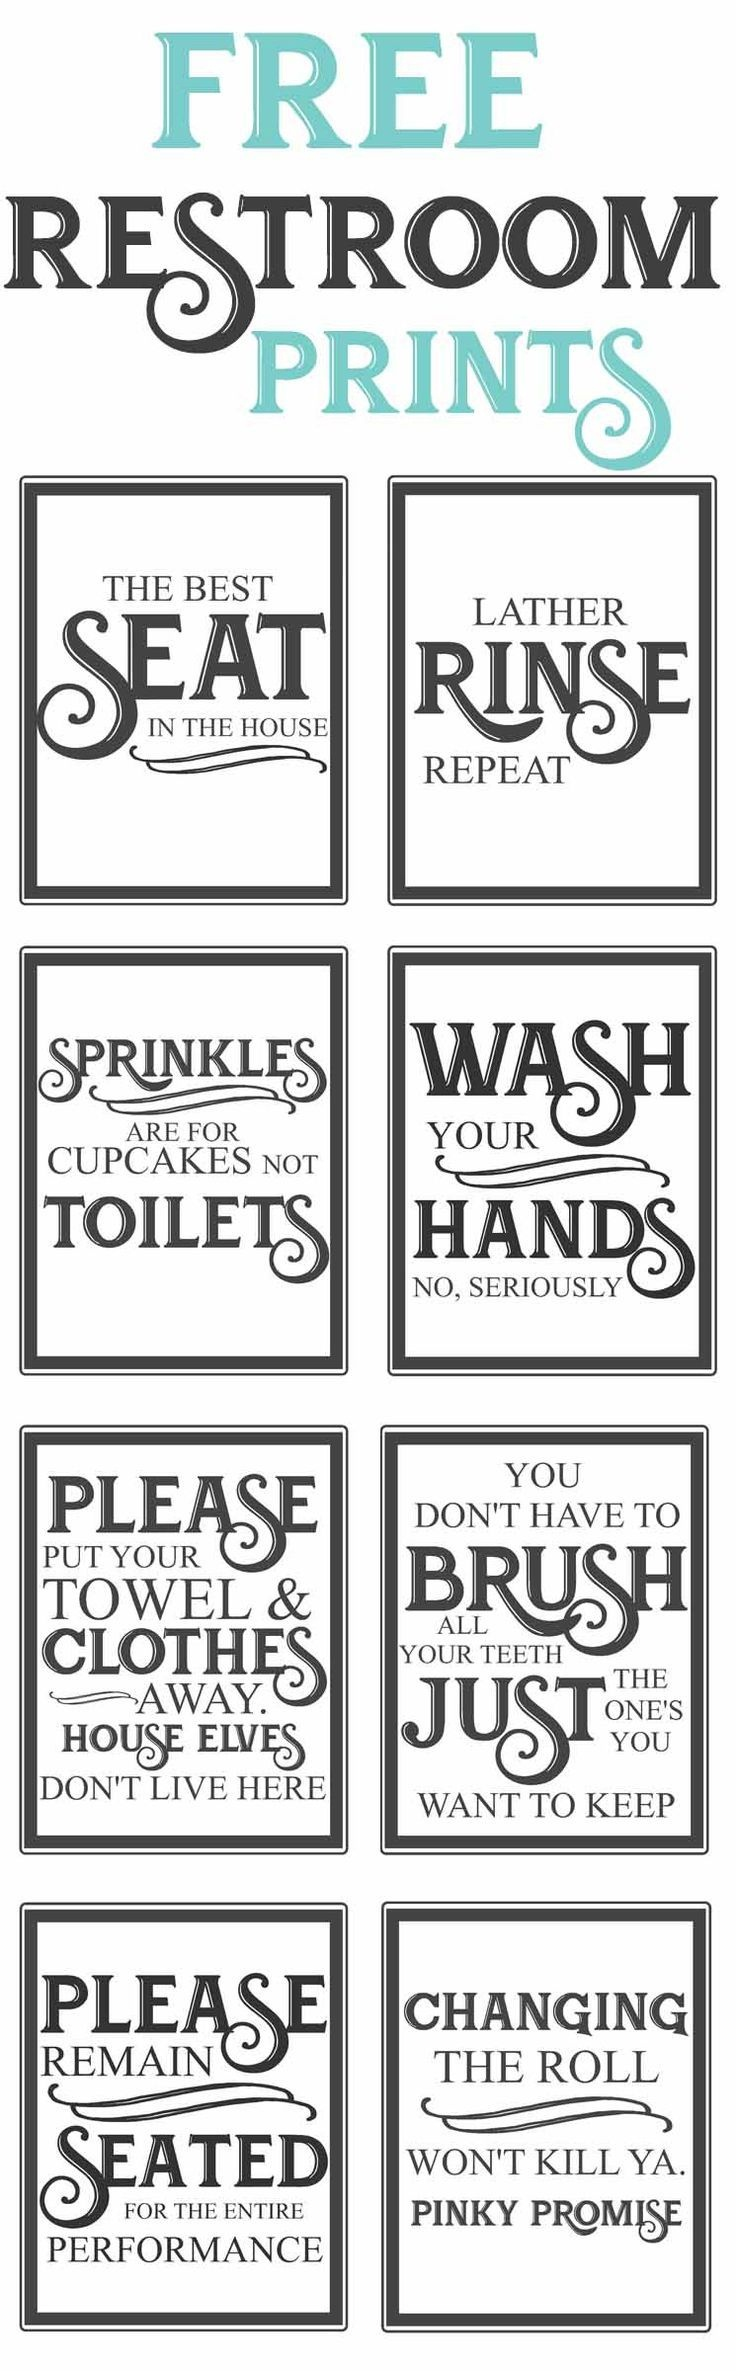 Free Vintage Bathroom Printables | Farmhouse | Vintage Bathrooms - Free Printable Funny Signs